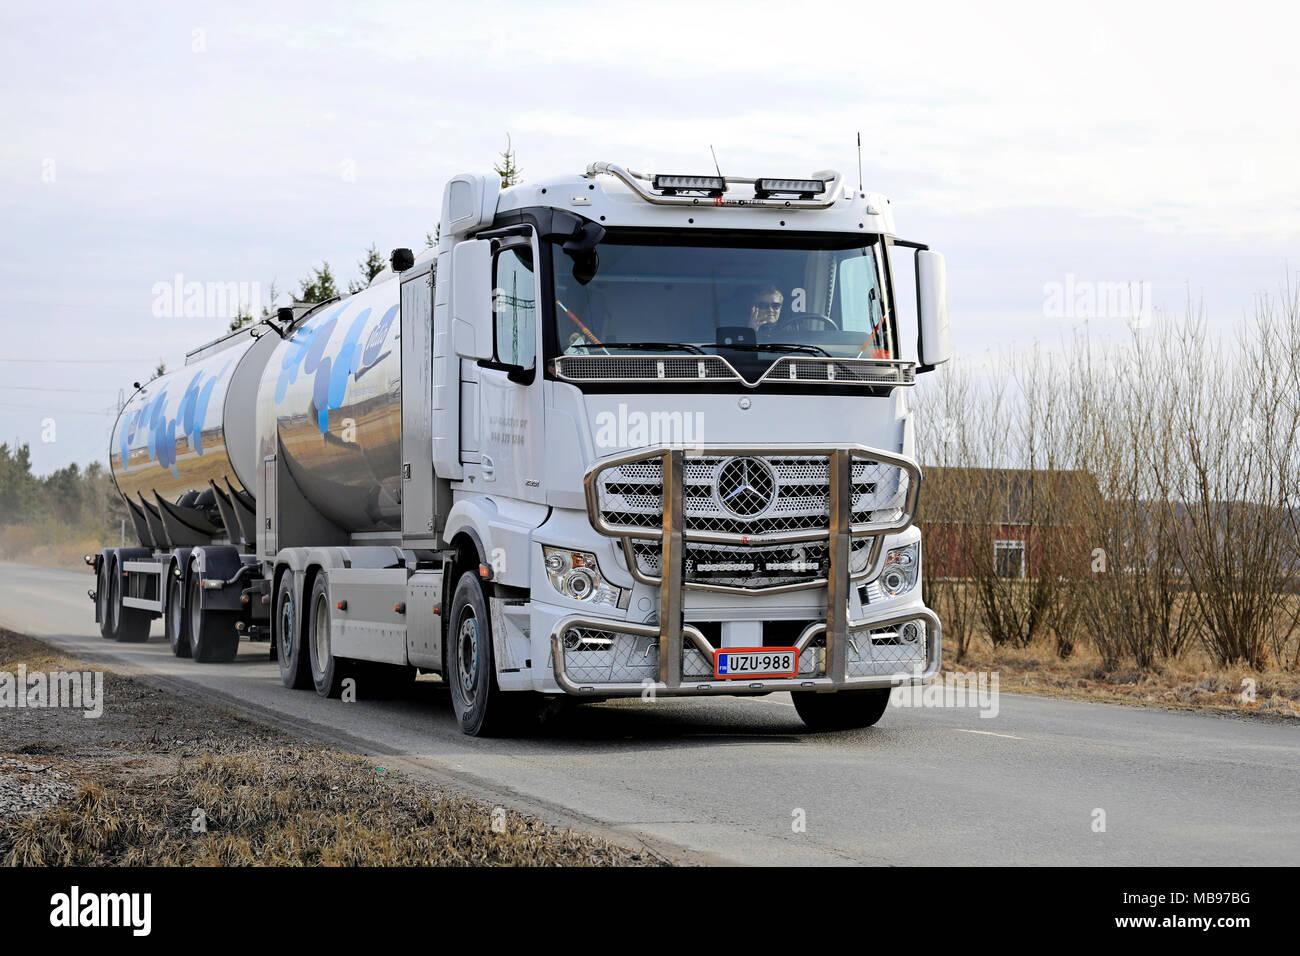 SALO, FINLAND - APRIL 8, 2018: Mercedes-Benz Actros 2551 tank truck of MJJ  Kuljetus Oy transports Valio Milk along road at spring.